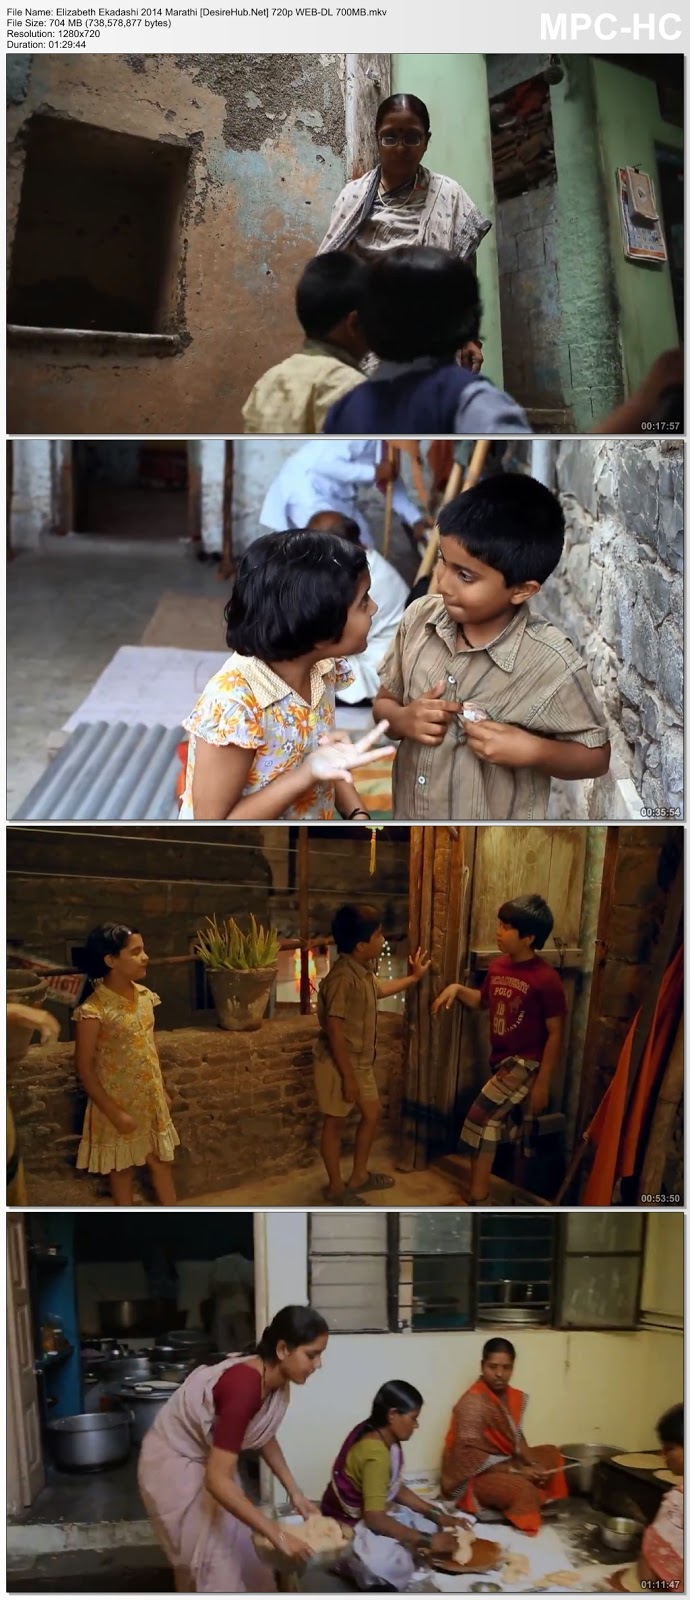 Elizabeth Ekadashi 2014 Marathi 480p WEB-DL 250MB Desirehub